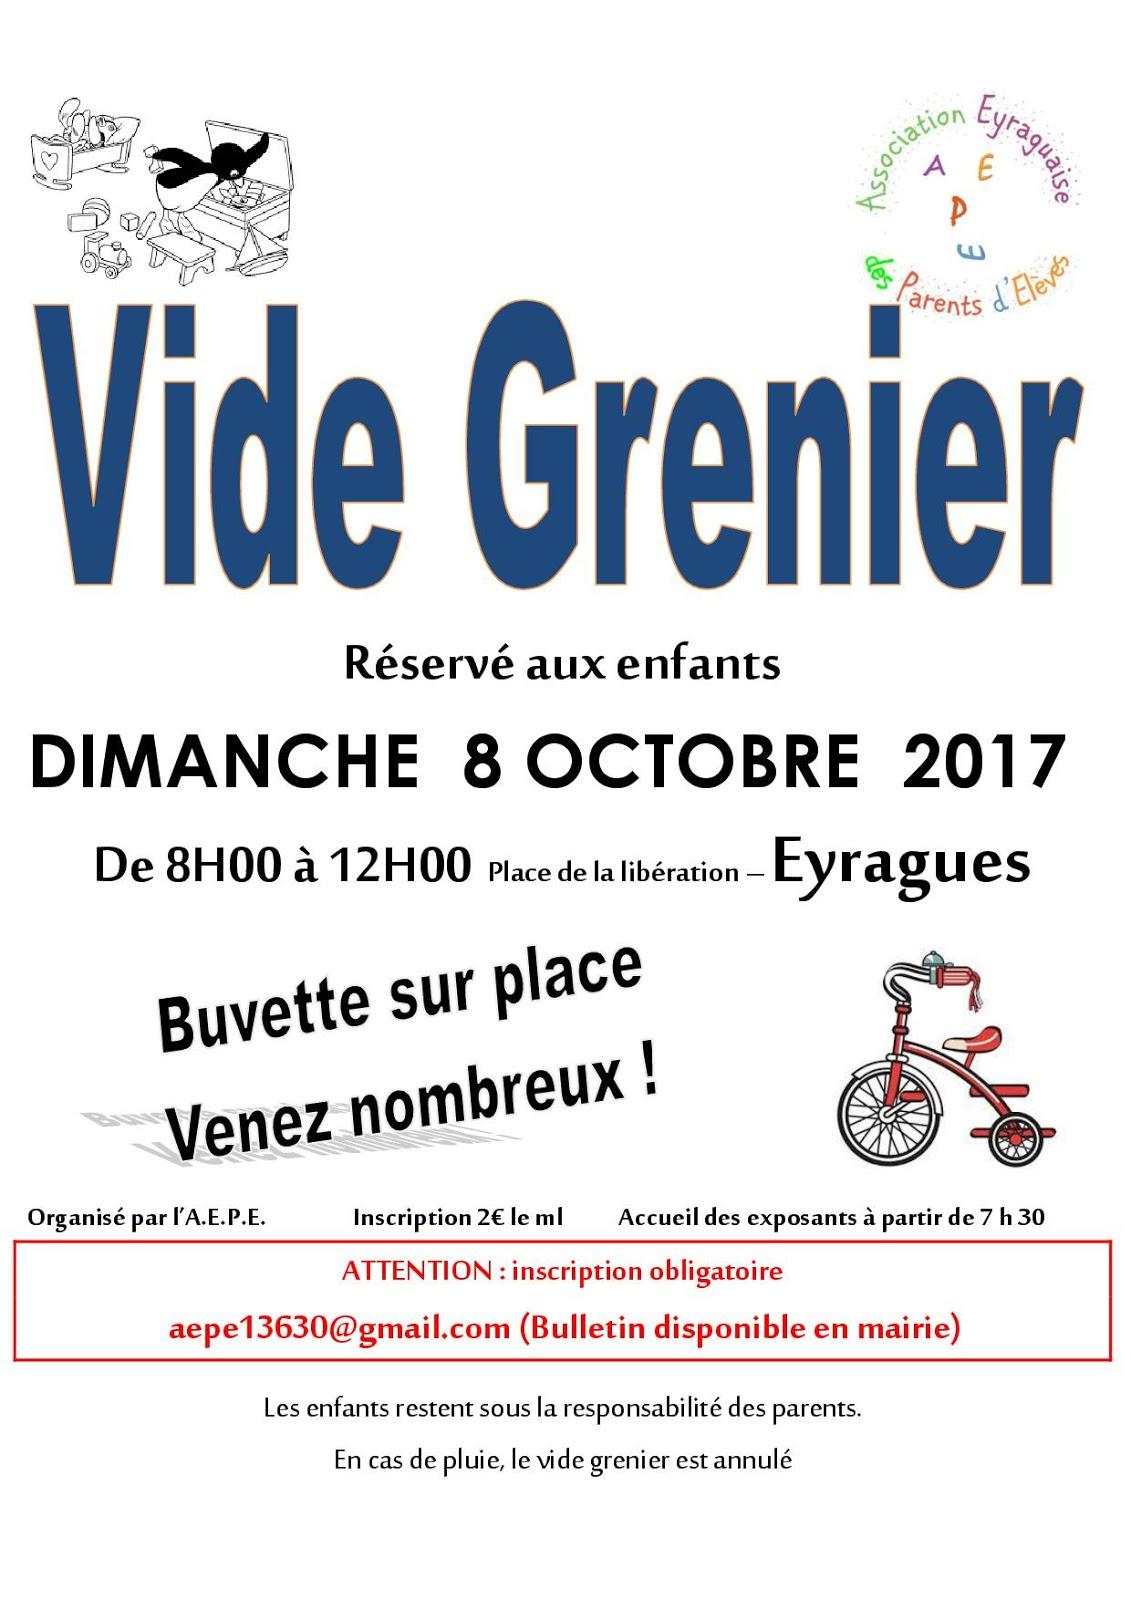 Le journal d 39 eyragues for Vide grenier loiret 2017